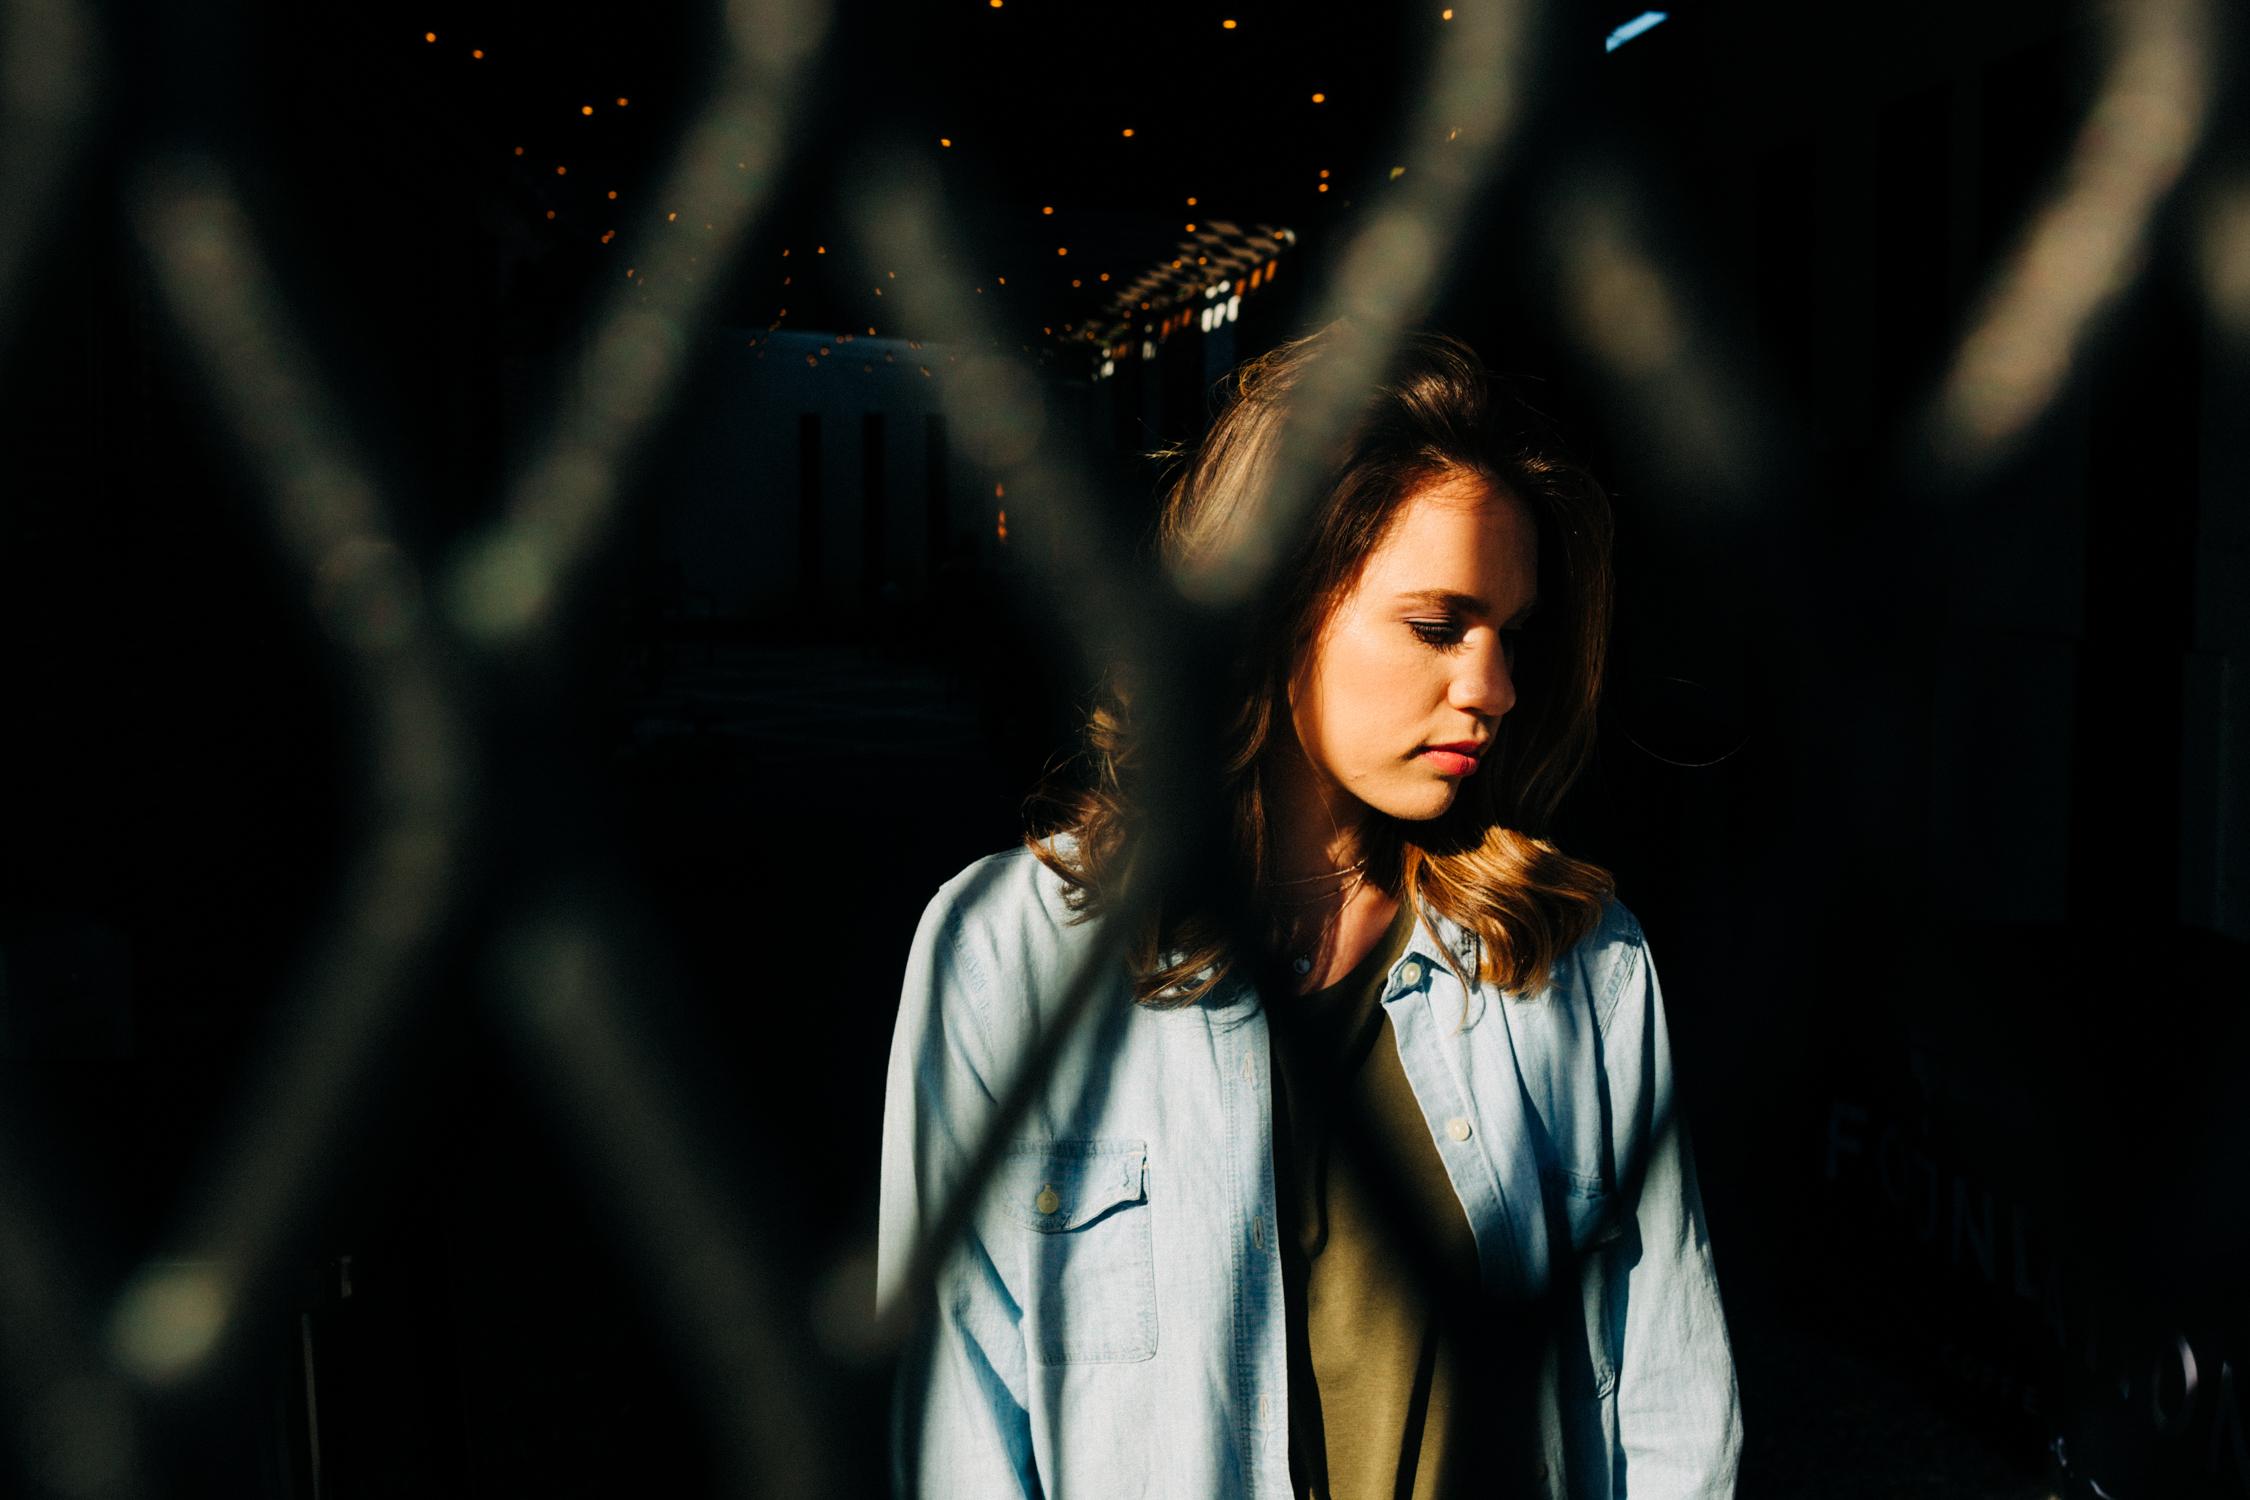 tampa senior portrait photography